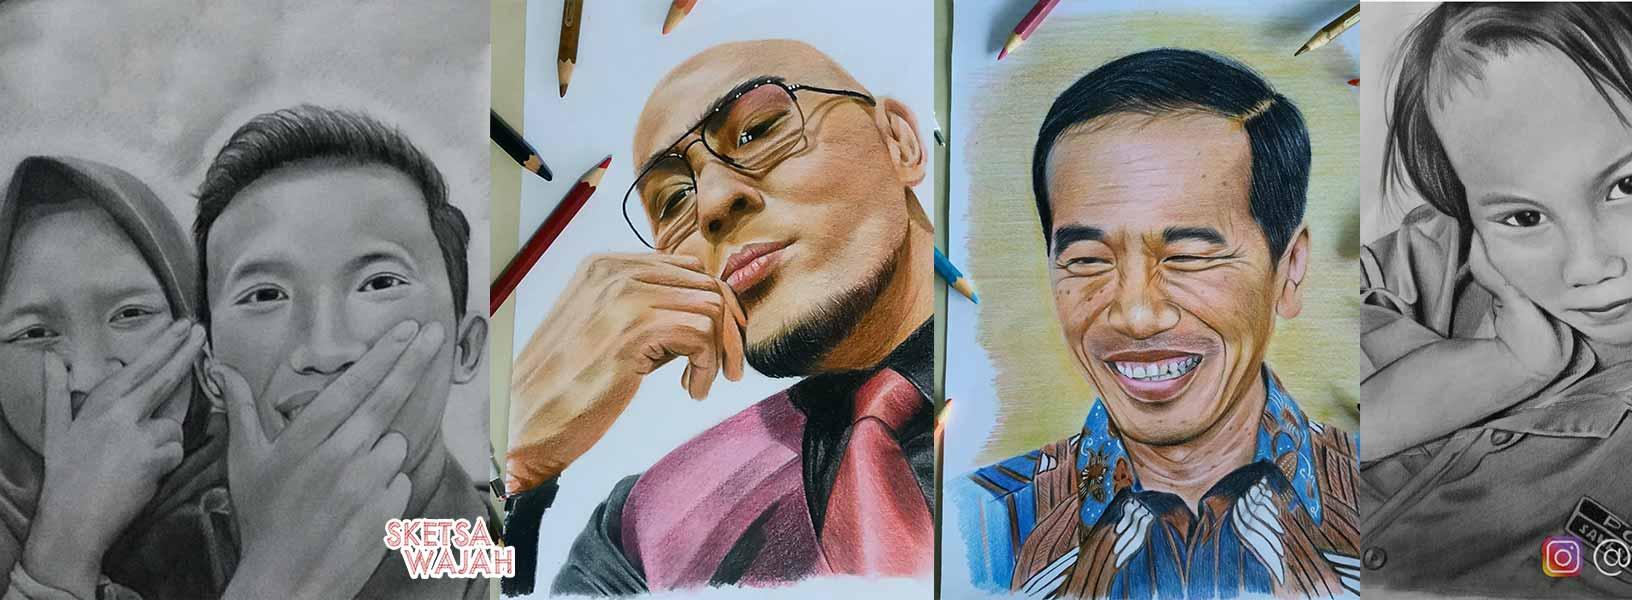 Karya Nurcahya Muhammad Ridwan sketcher Sketsa Wajah